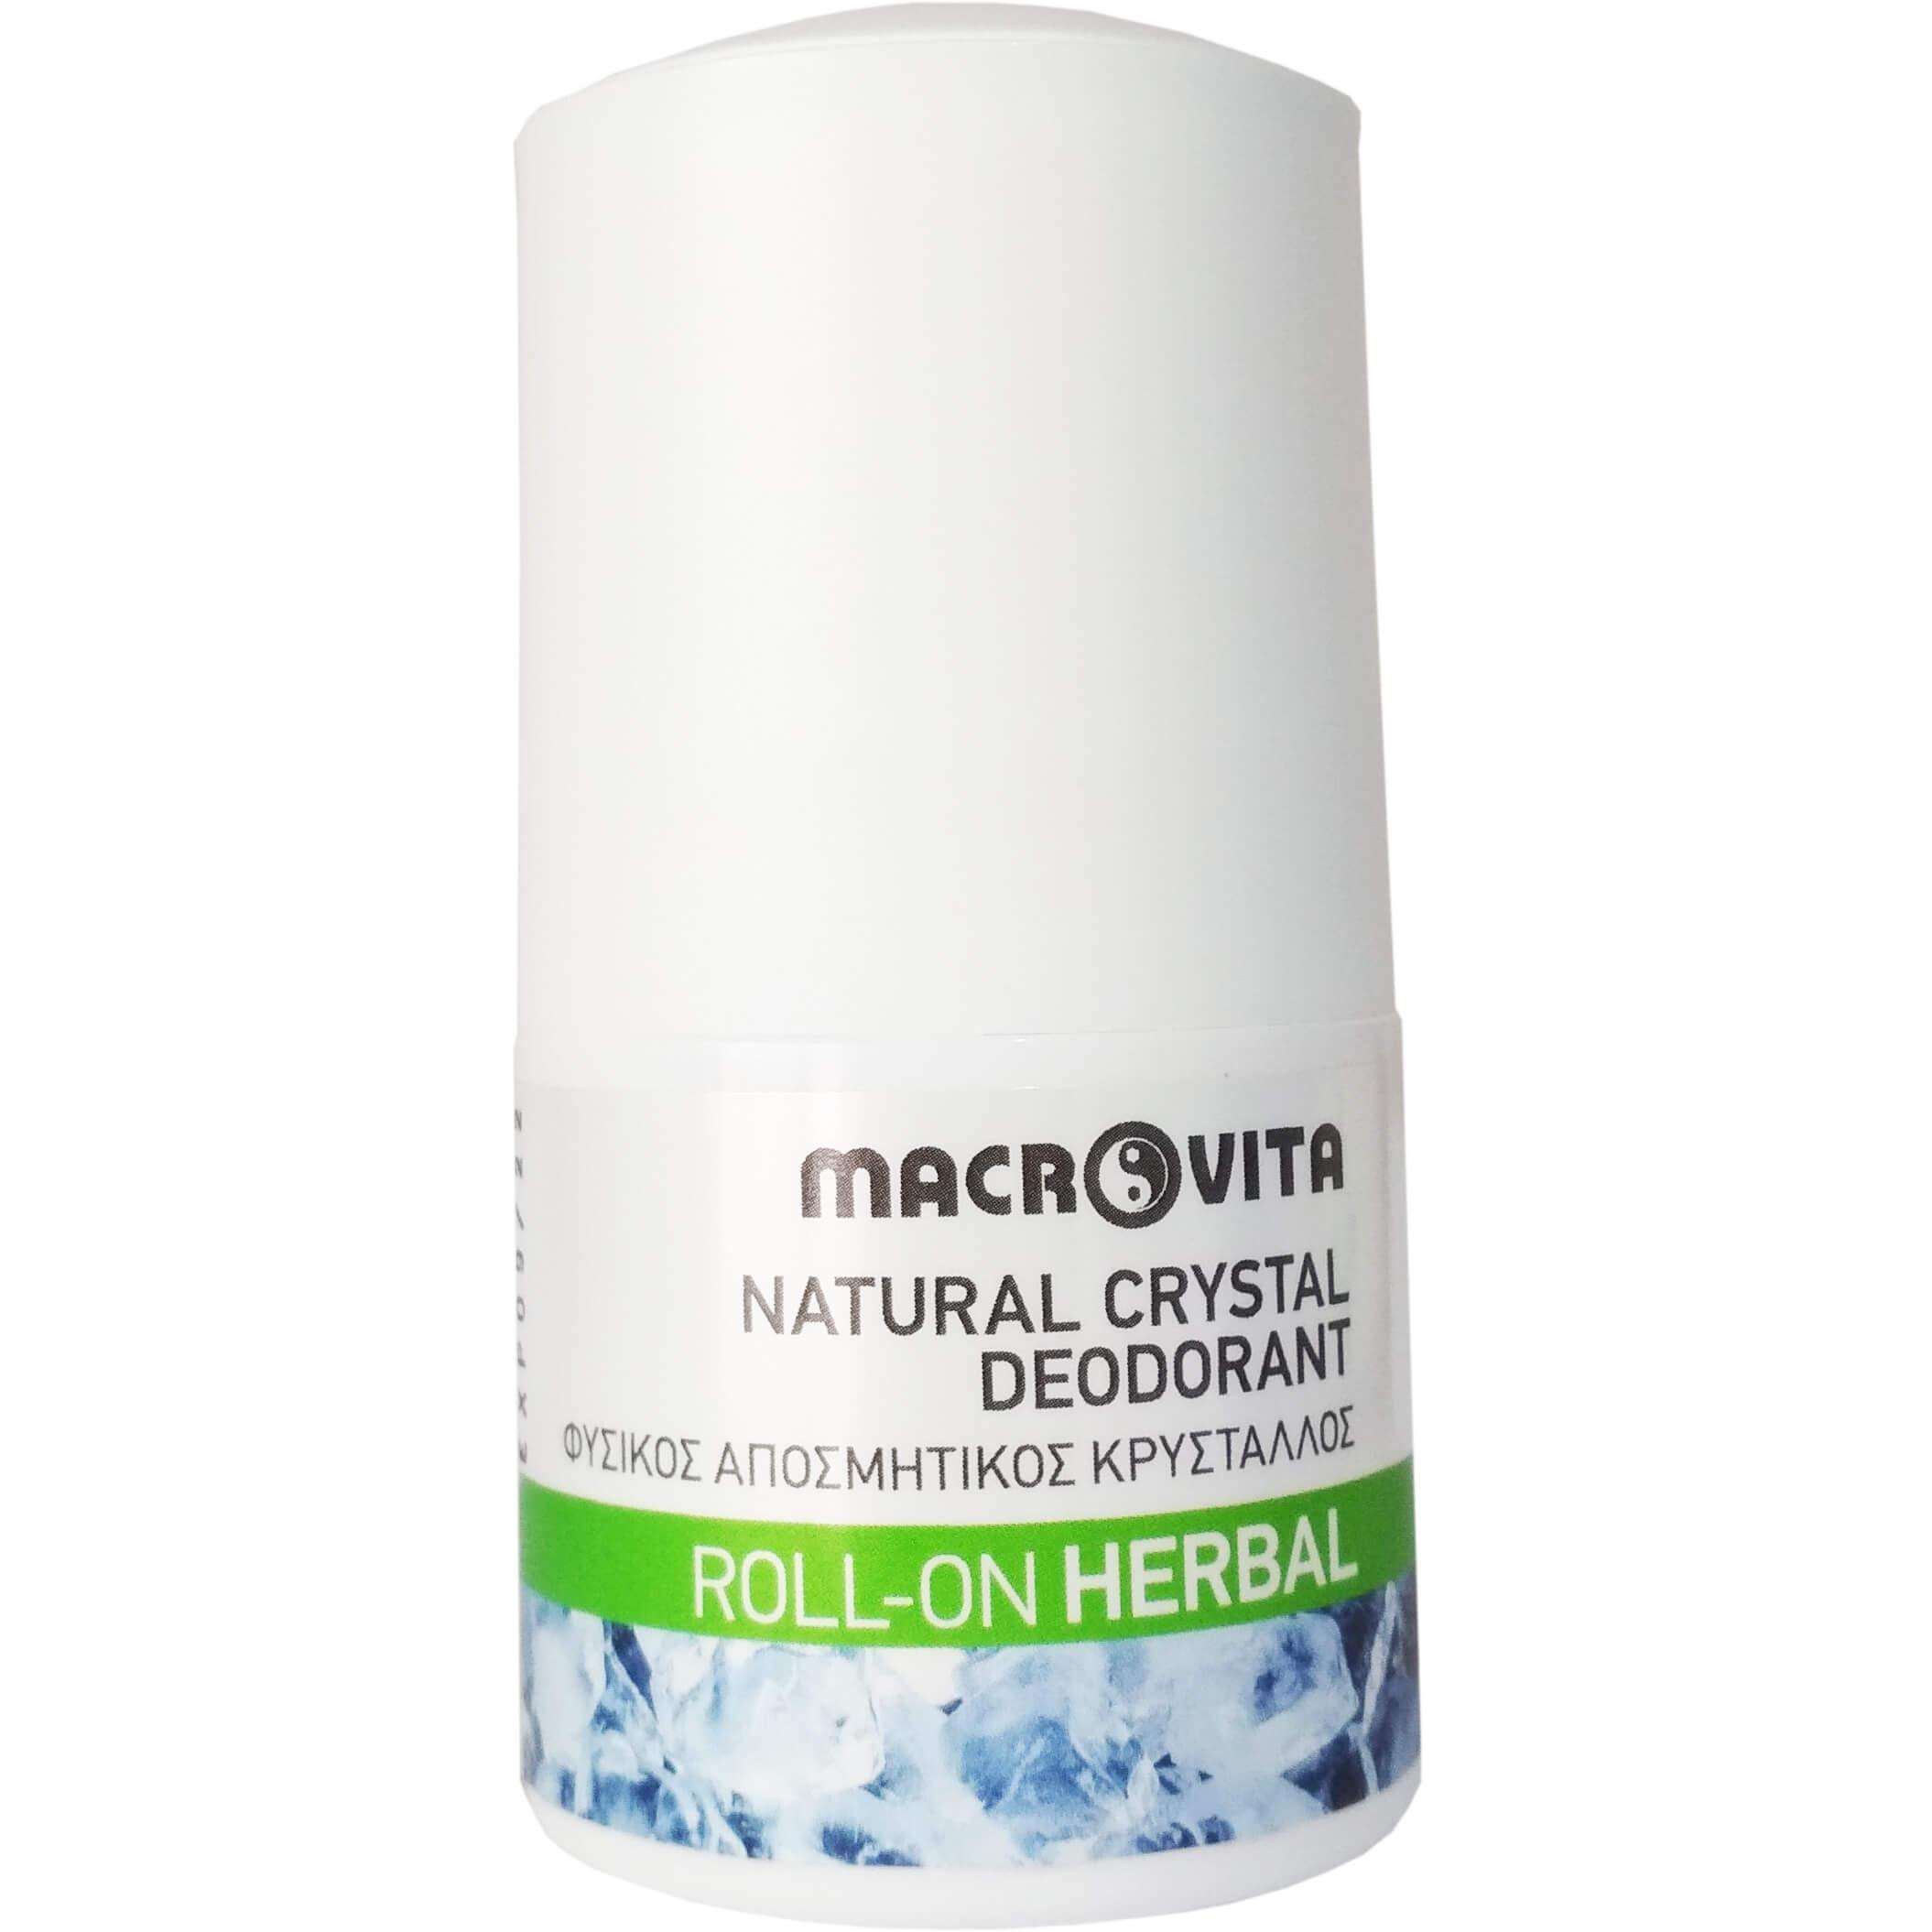 Macrovita Natural Crystal Deodorant Φυσικός Αποσμητικός Κρύσταλλος Roll-On Άρωμα Herbal 50ml